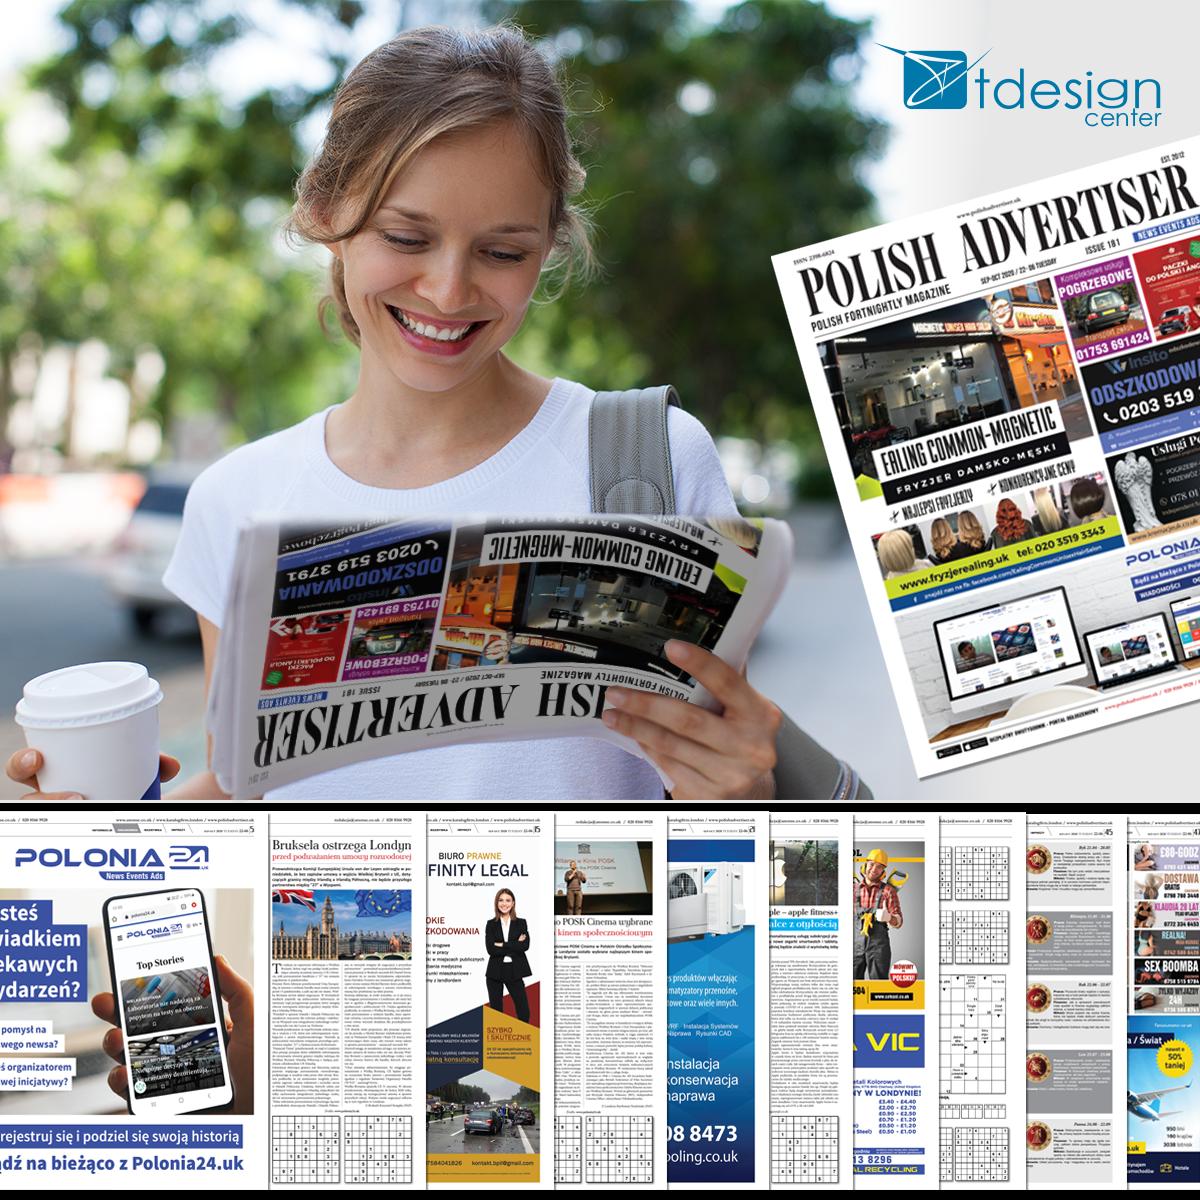 Polish-_Advertiser_wydanie181_stron48_skladDTP.png